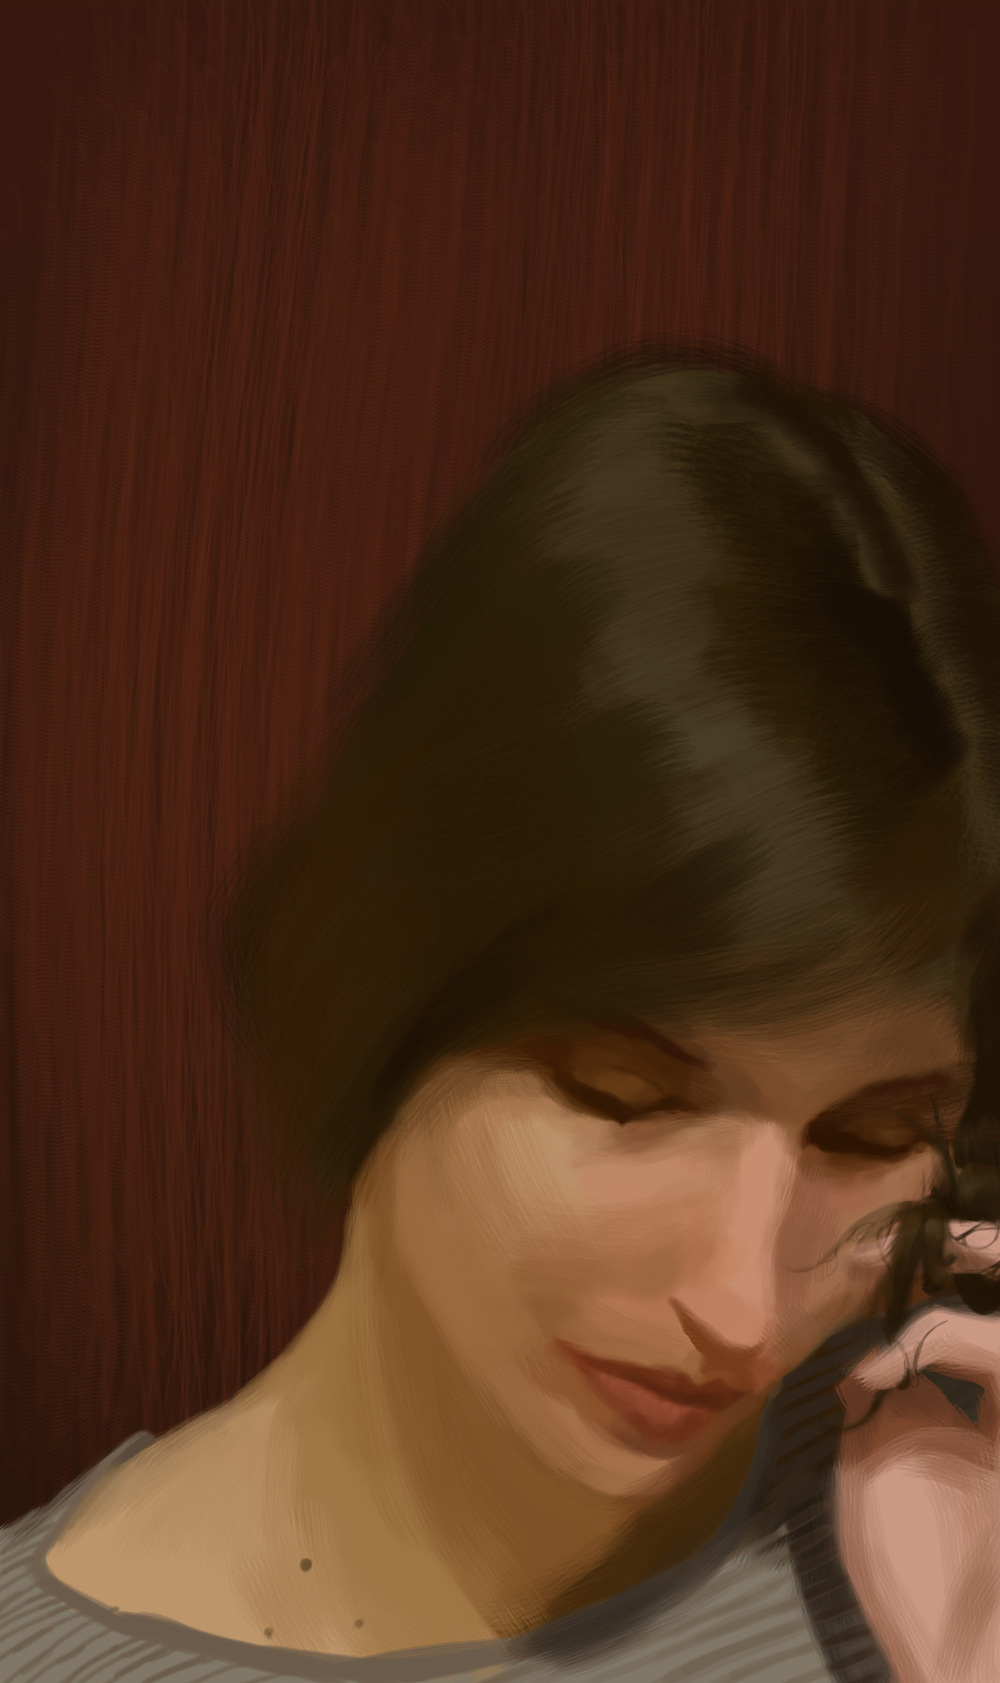 myPortfolio - Joanne - digital portrait